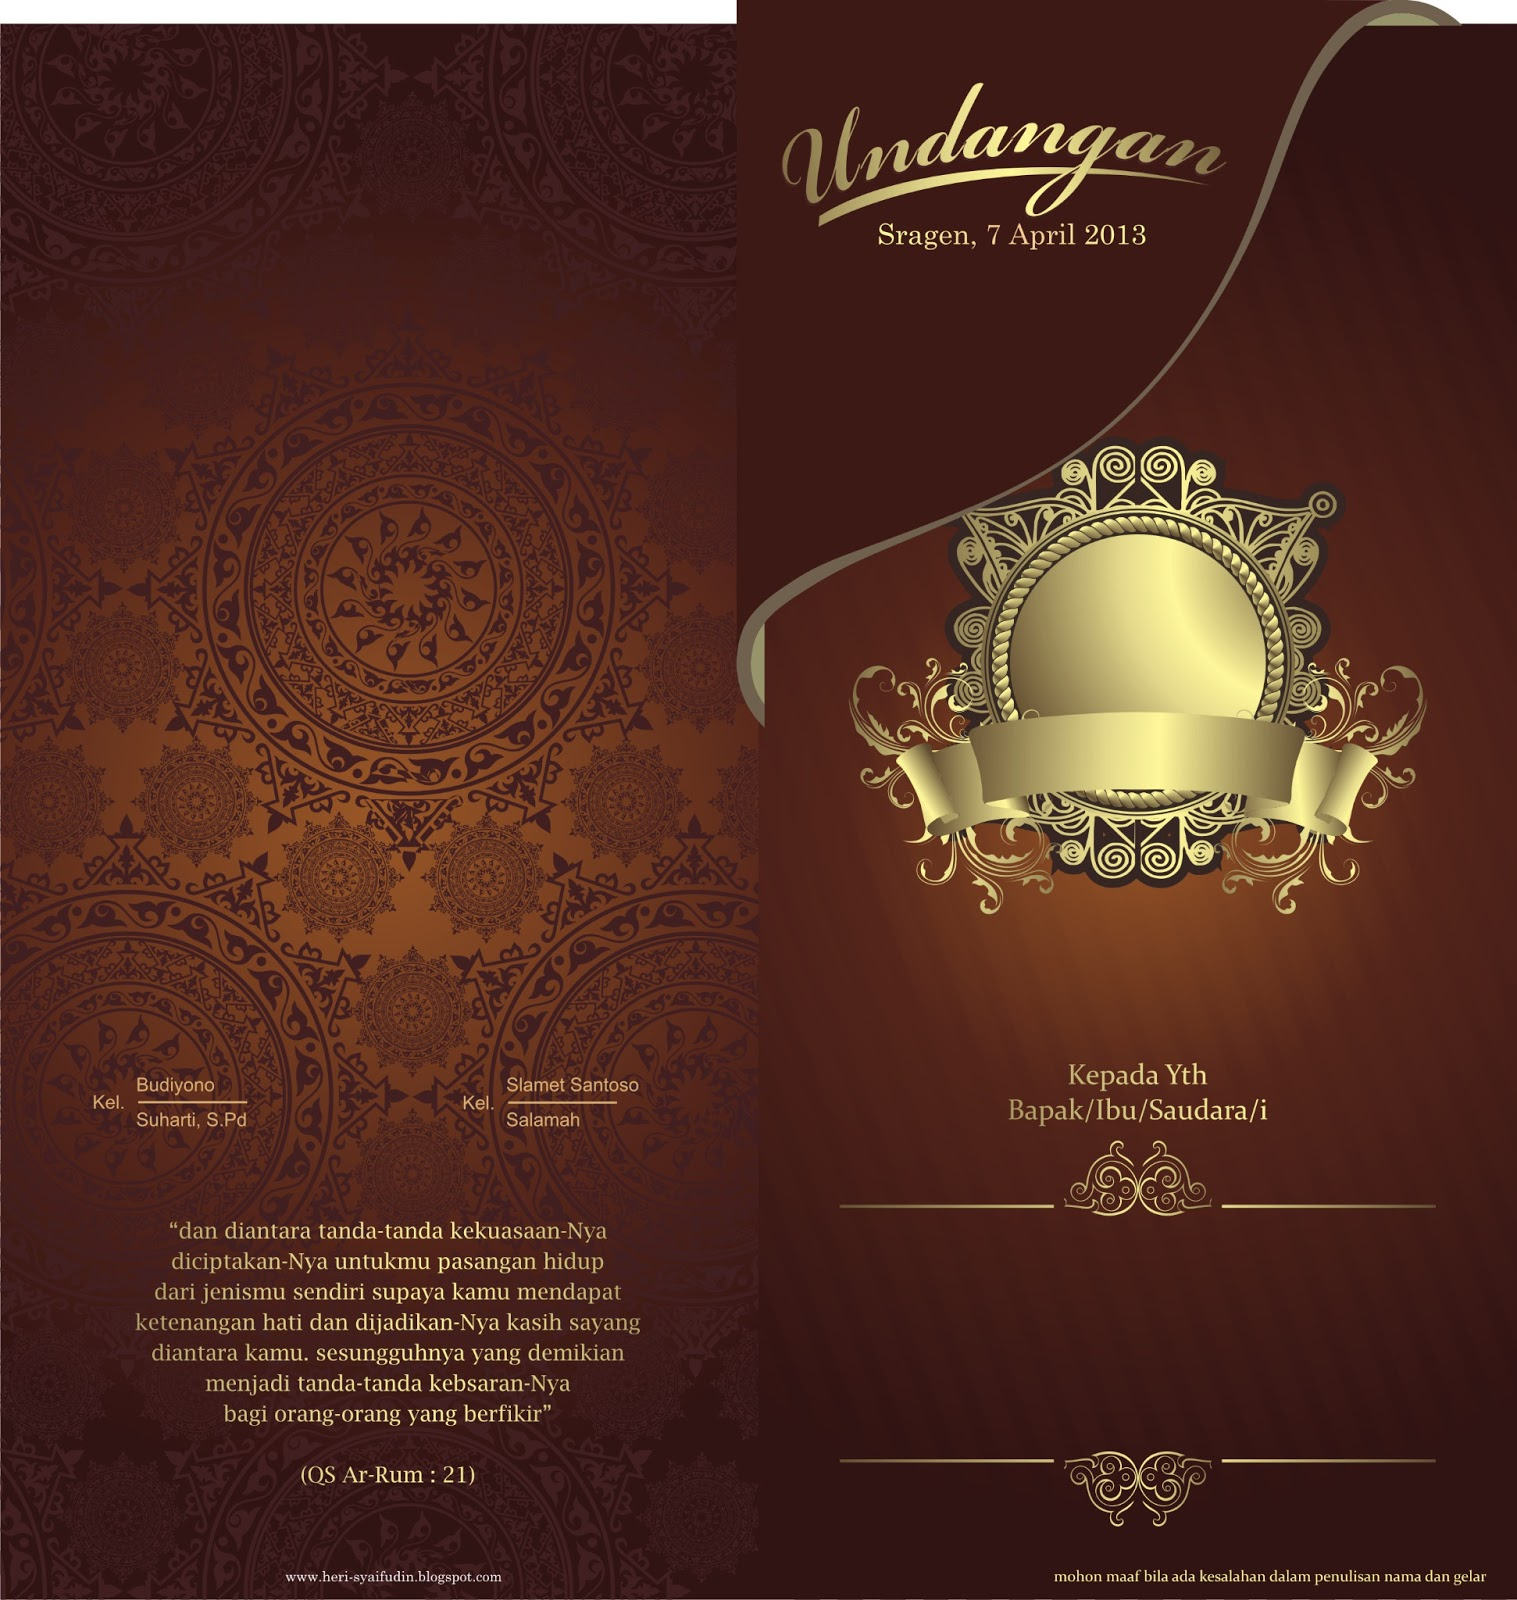 Download Desain Undangan Pernikahan Psd Koleksi Template Nota Siap Edit Format Cdr Kad Kahwin